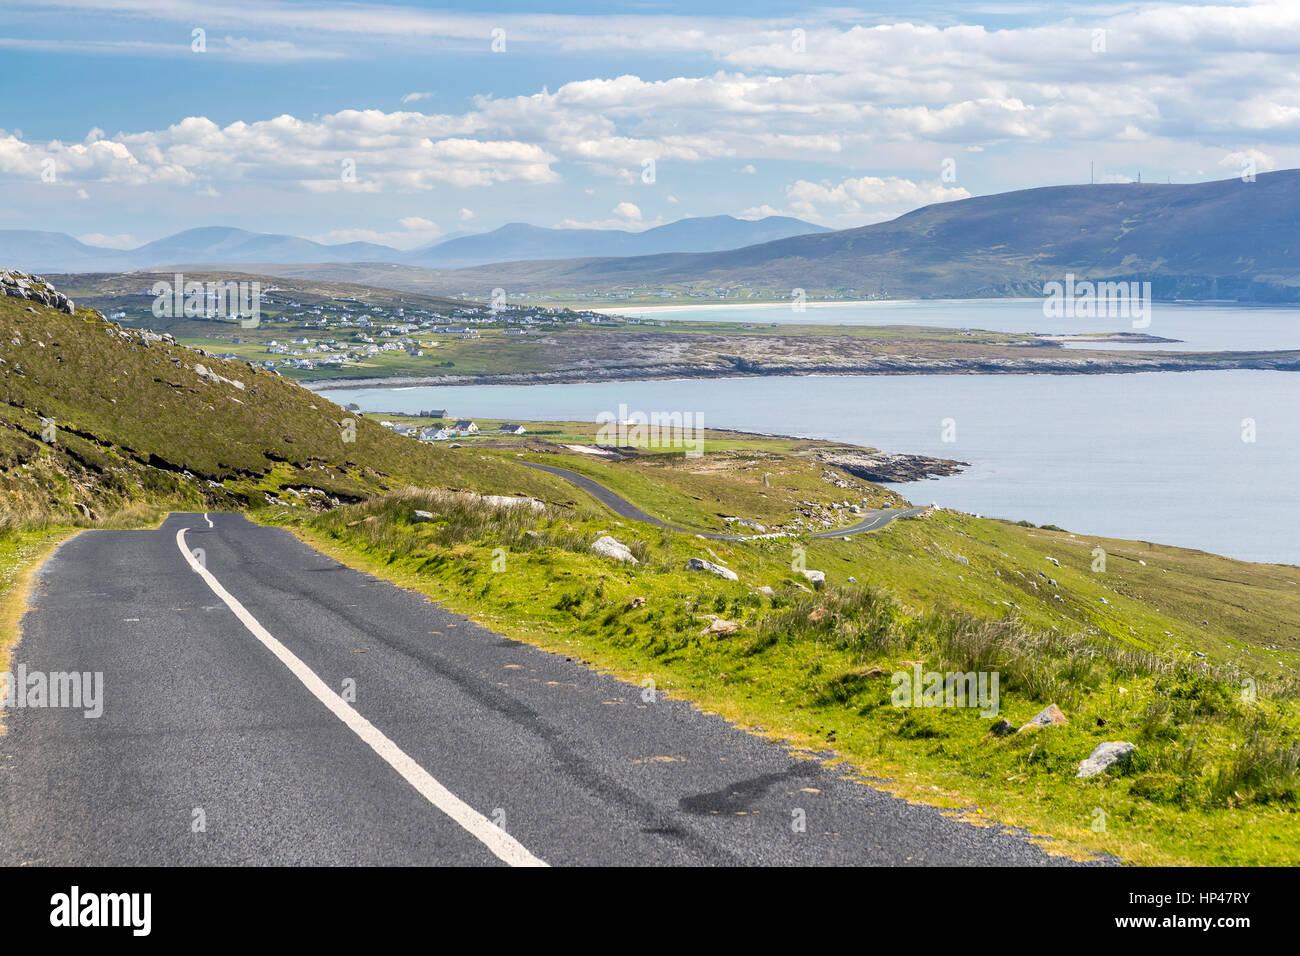 Achill Island seen from Wild Atlantic Way, County Mayo, Ireland, Europe. - Stock Image